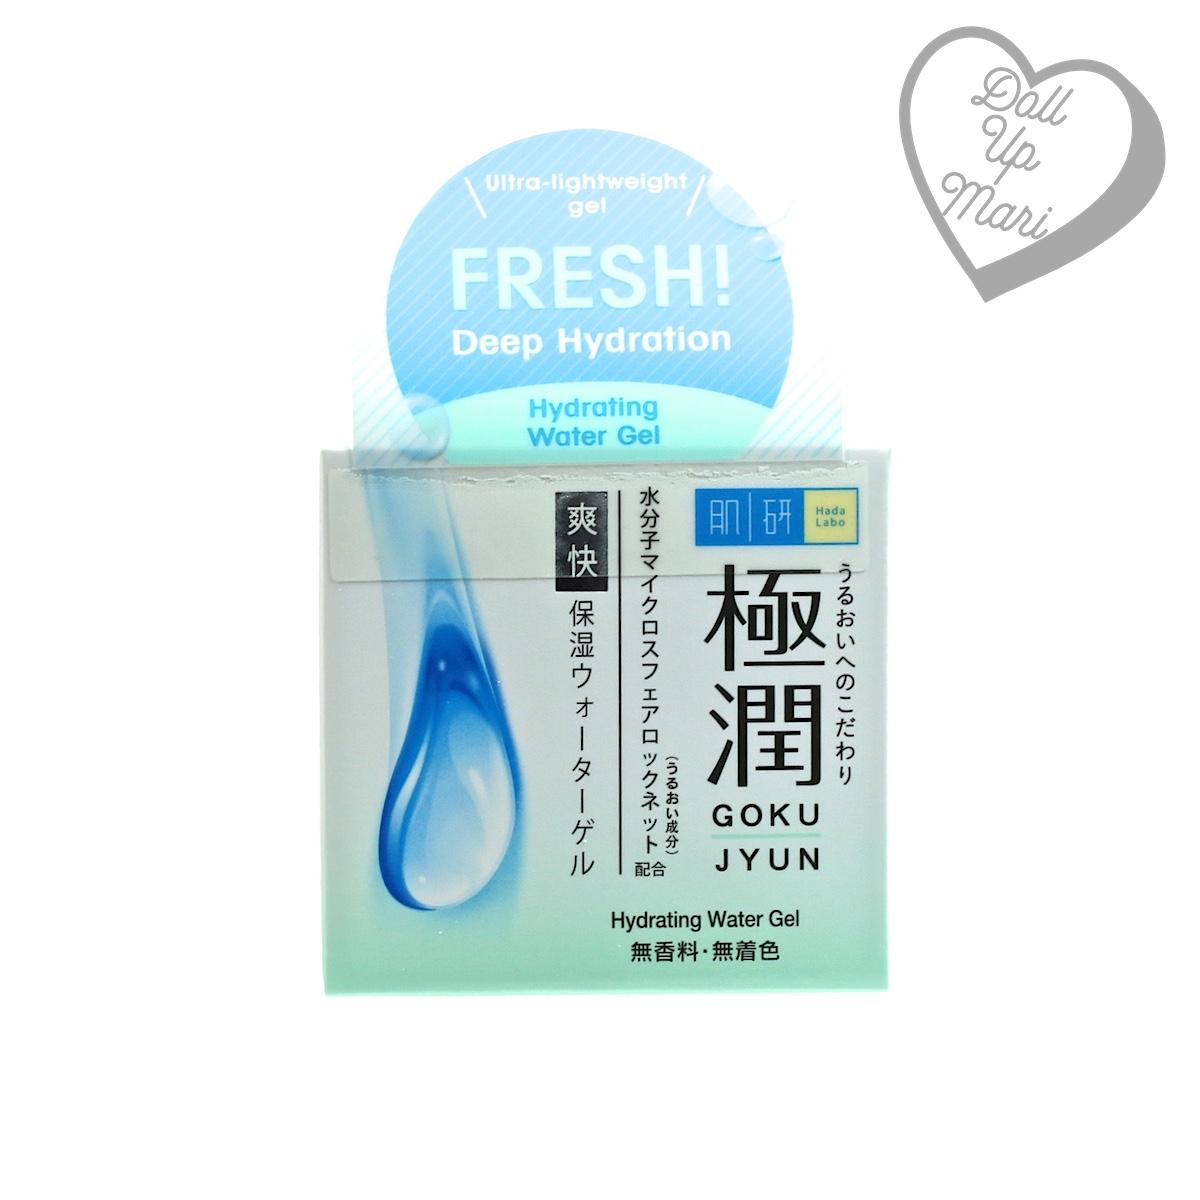 Hada Labo Gokujyun Hydrating Water Gel Box